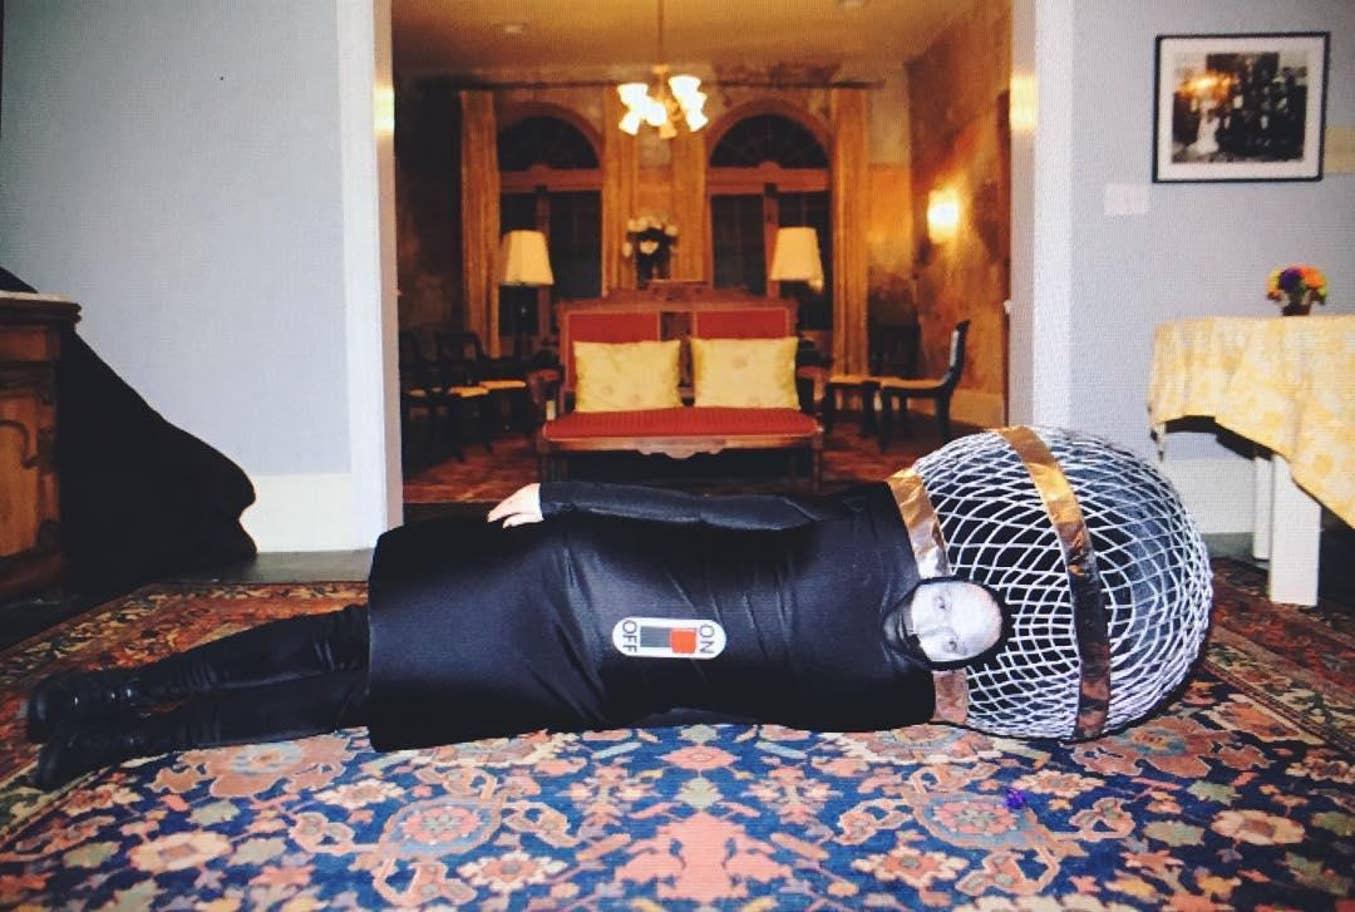 Katy Perry mint a leejtett mikrofon (mic drop!)